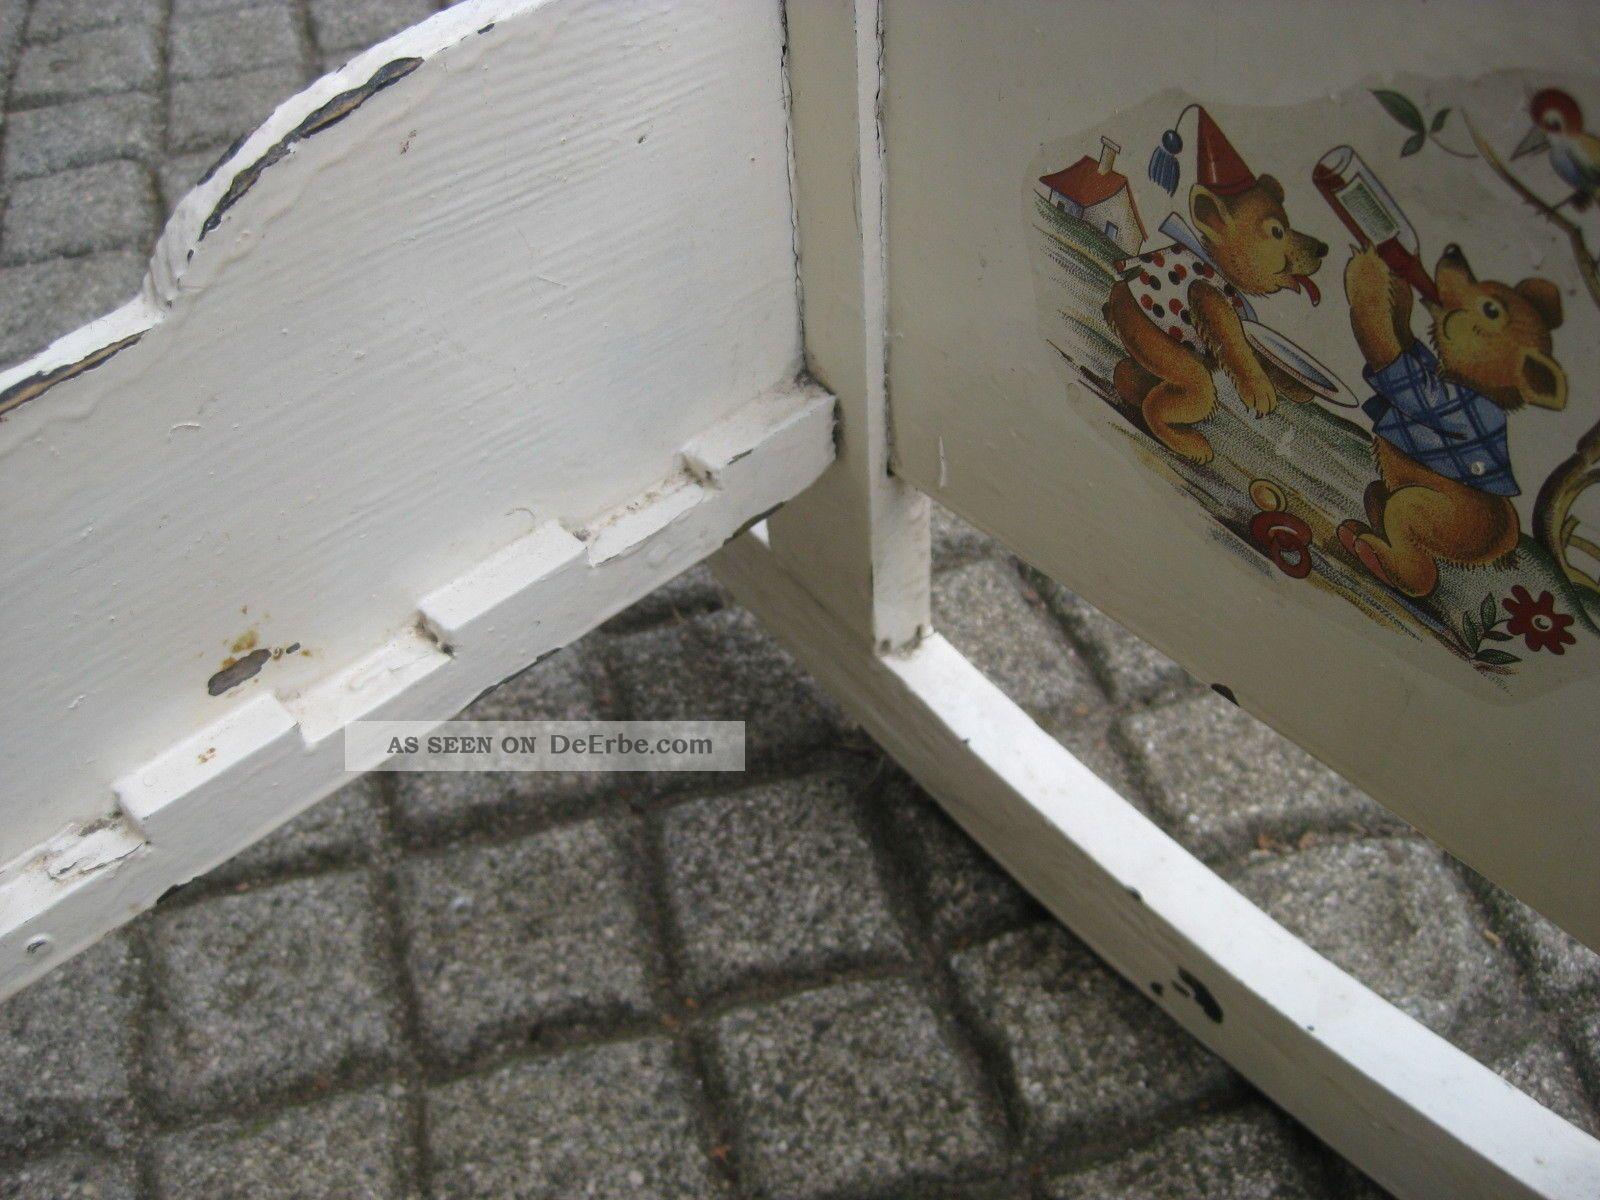 puppenwiege puppenbett l b h 44 21 20cm bett f puppe masiv holz alt antik 1900. Black Bedroom Furniture Sets. Home Design Ideas